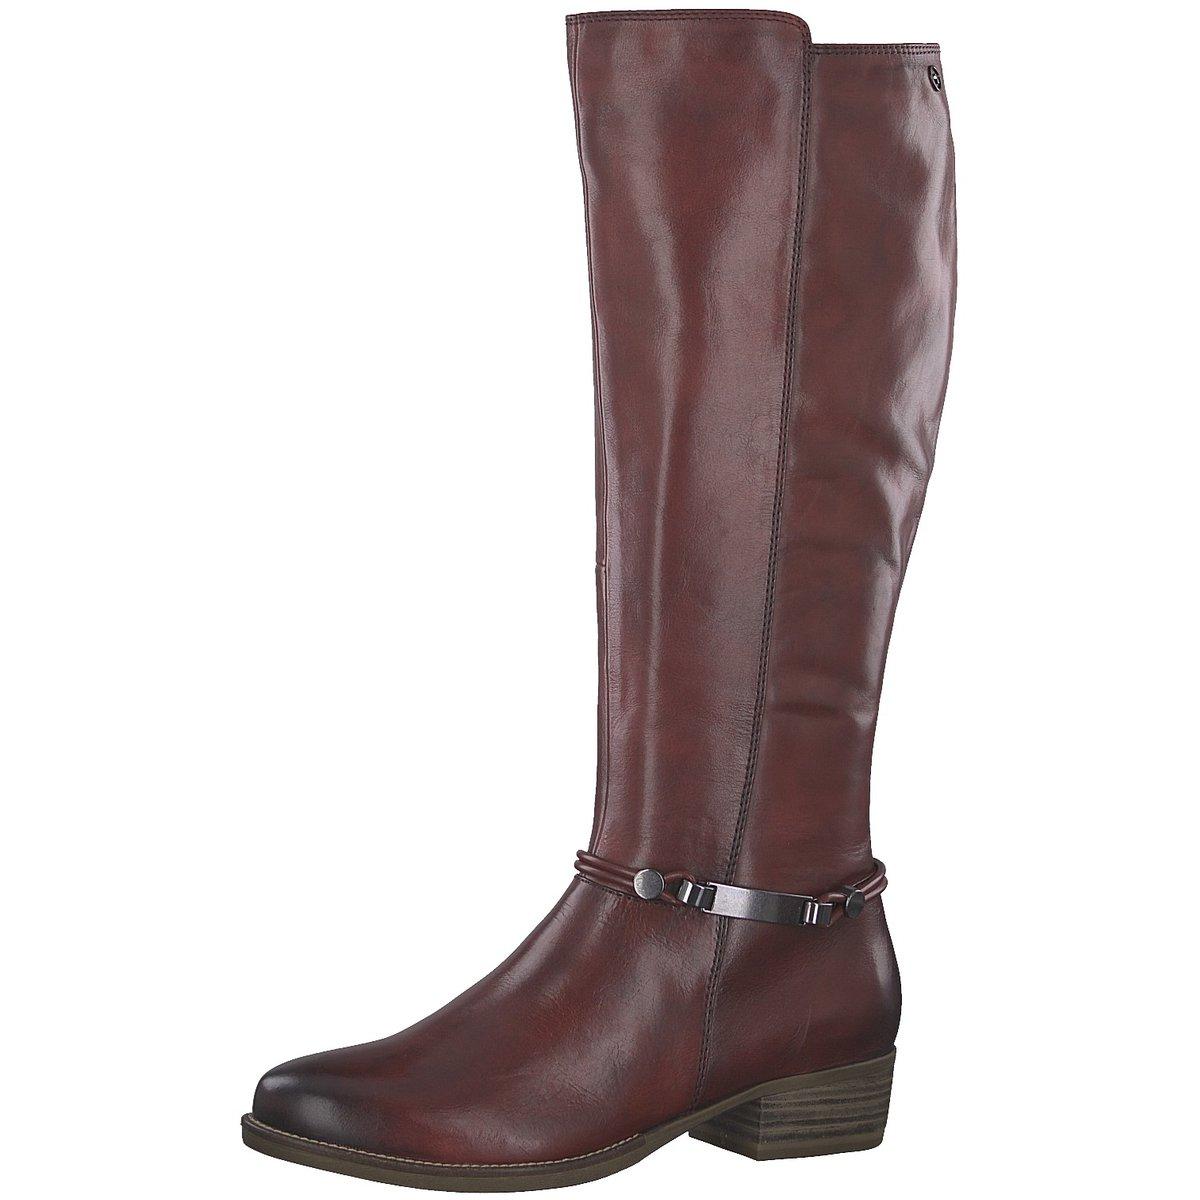 Details zu Tamaris Damen Stiefel Woms Boots 25509 21 536 rot 523985